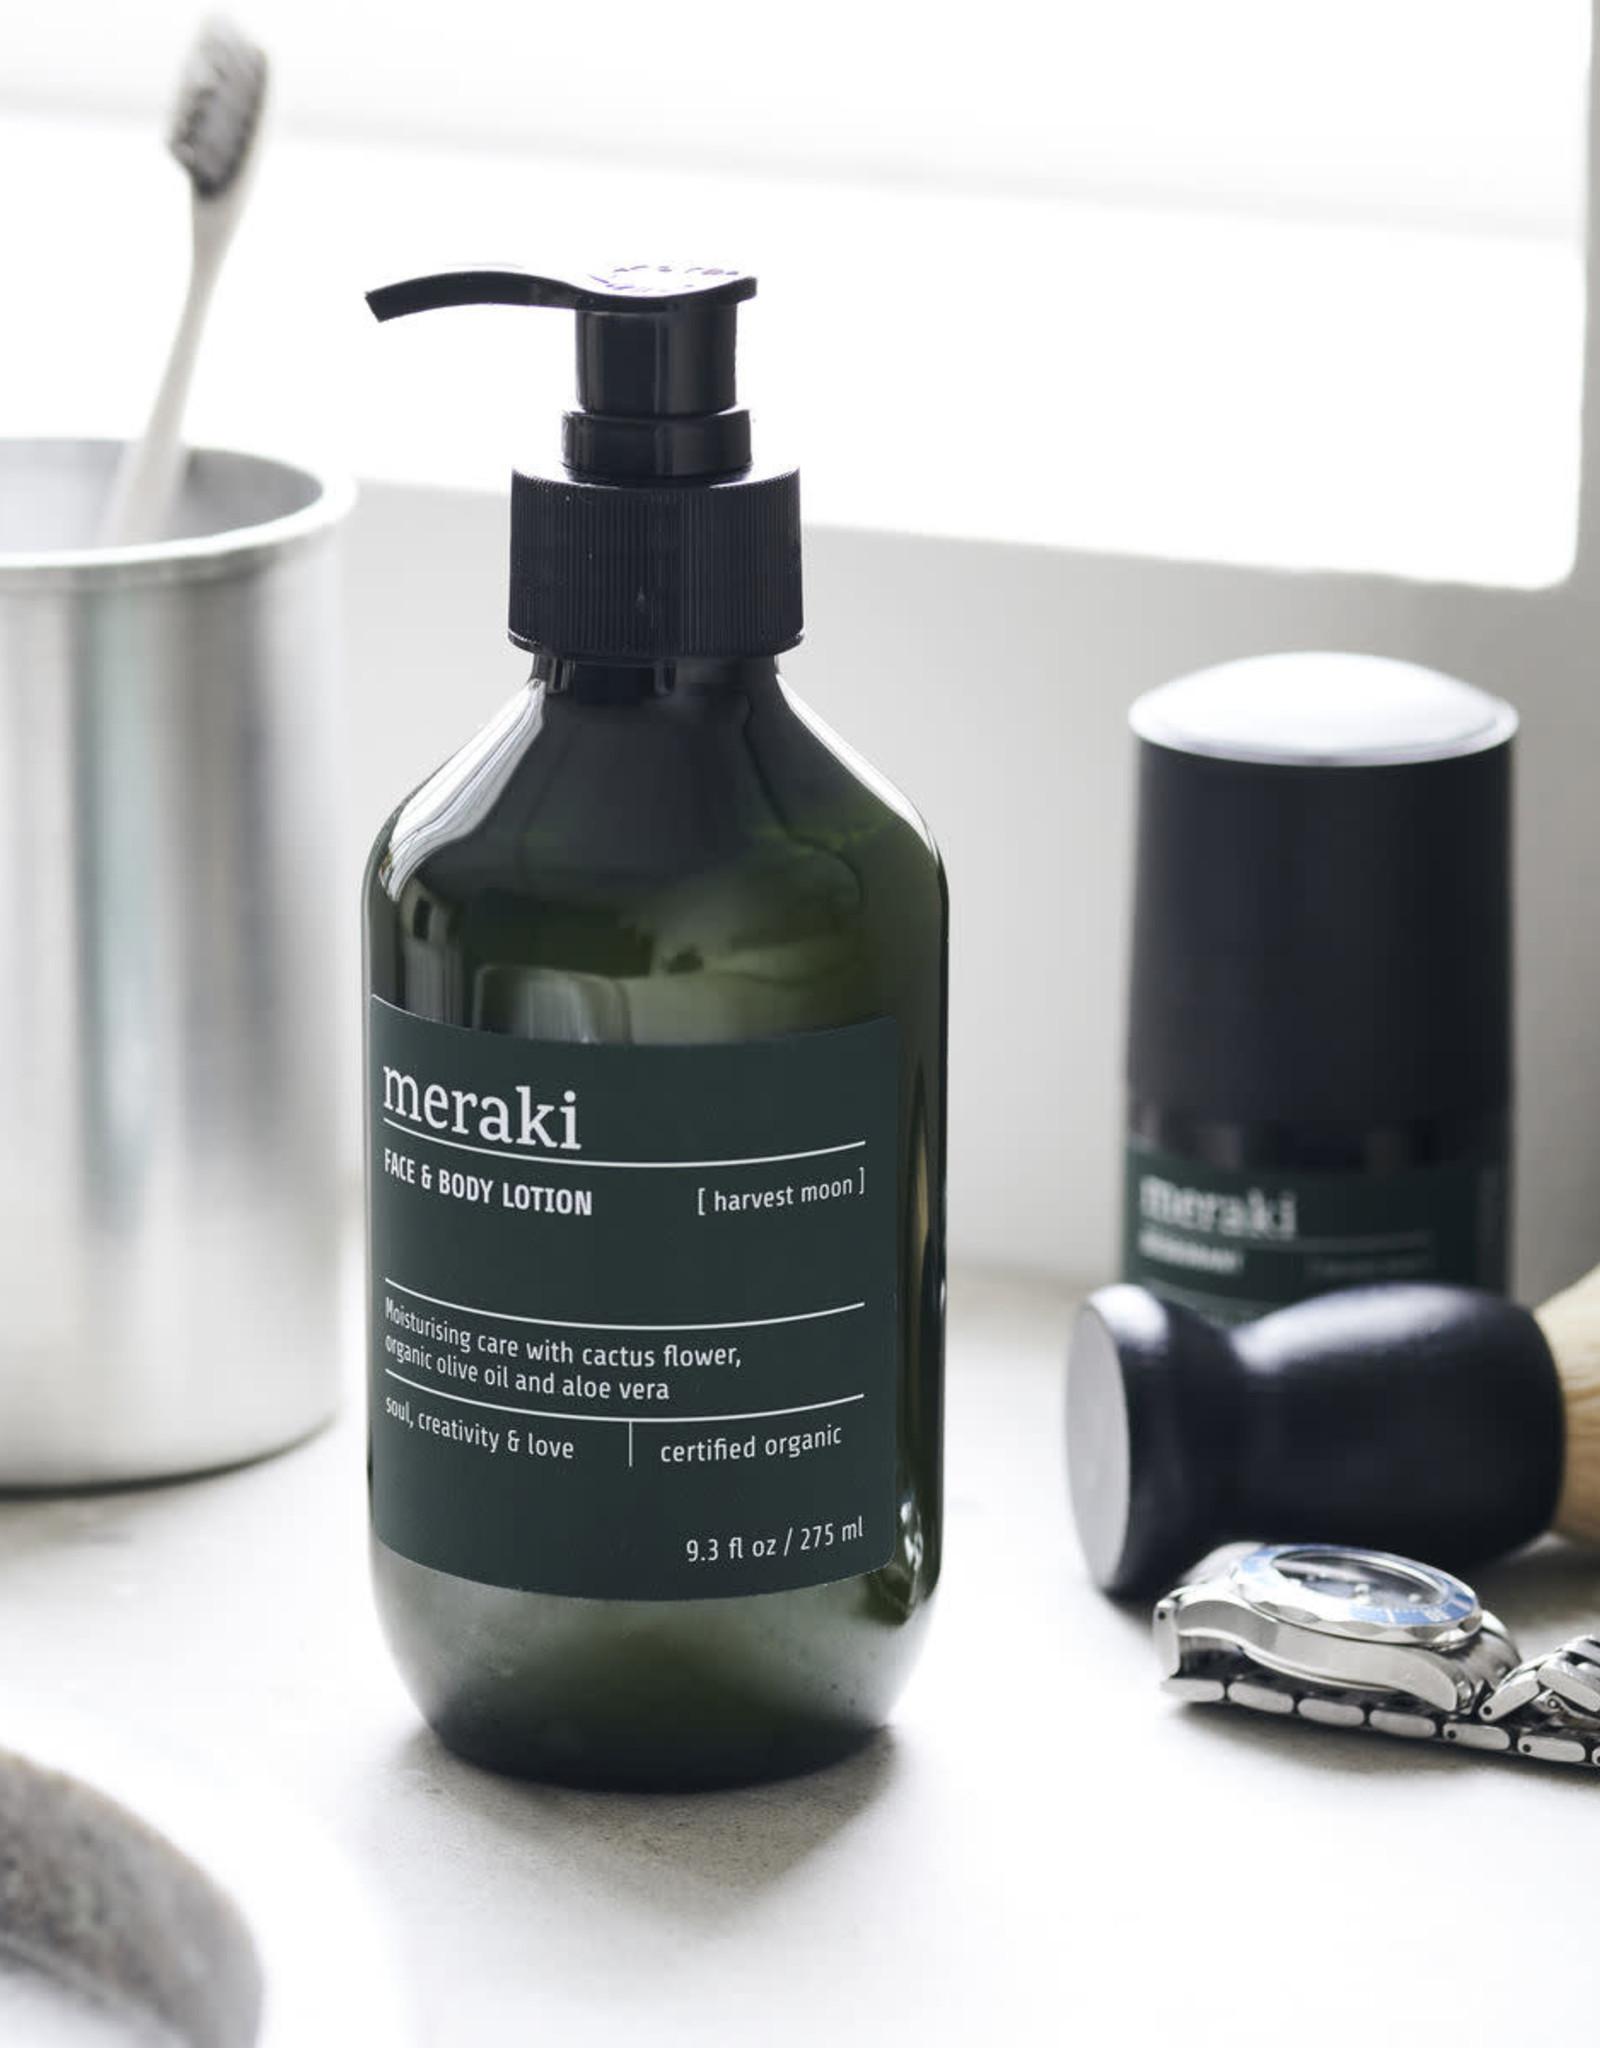 Meraki Meraki - Face & body lotion, harvest moon